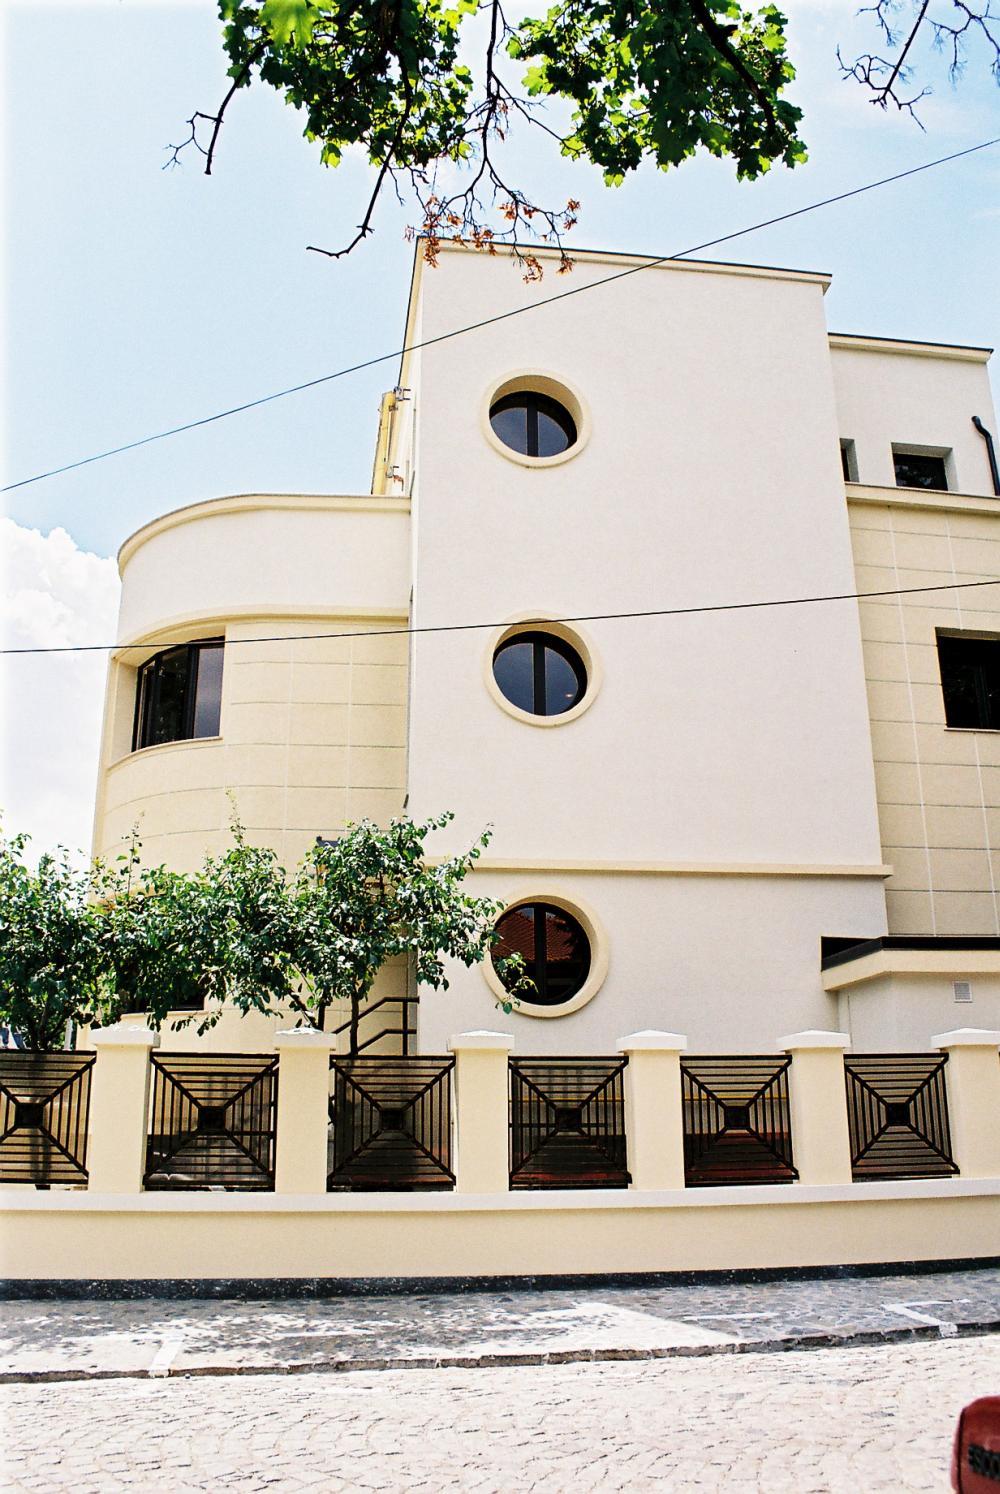 https://nbc-arhitect.ro/wp-content/uploads/2020/10/NBC-Arhitect-_-restorations-_-Pangrati-House-_-Romania_master-photo.jpg